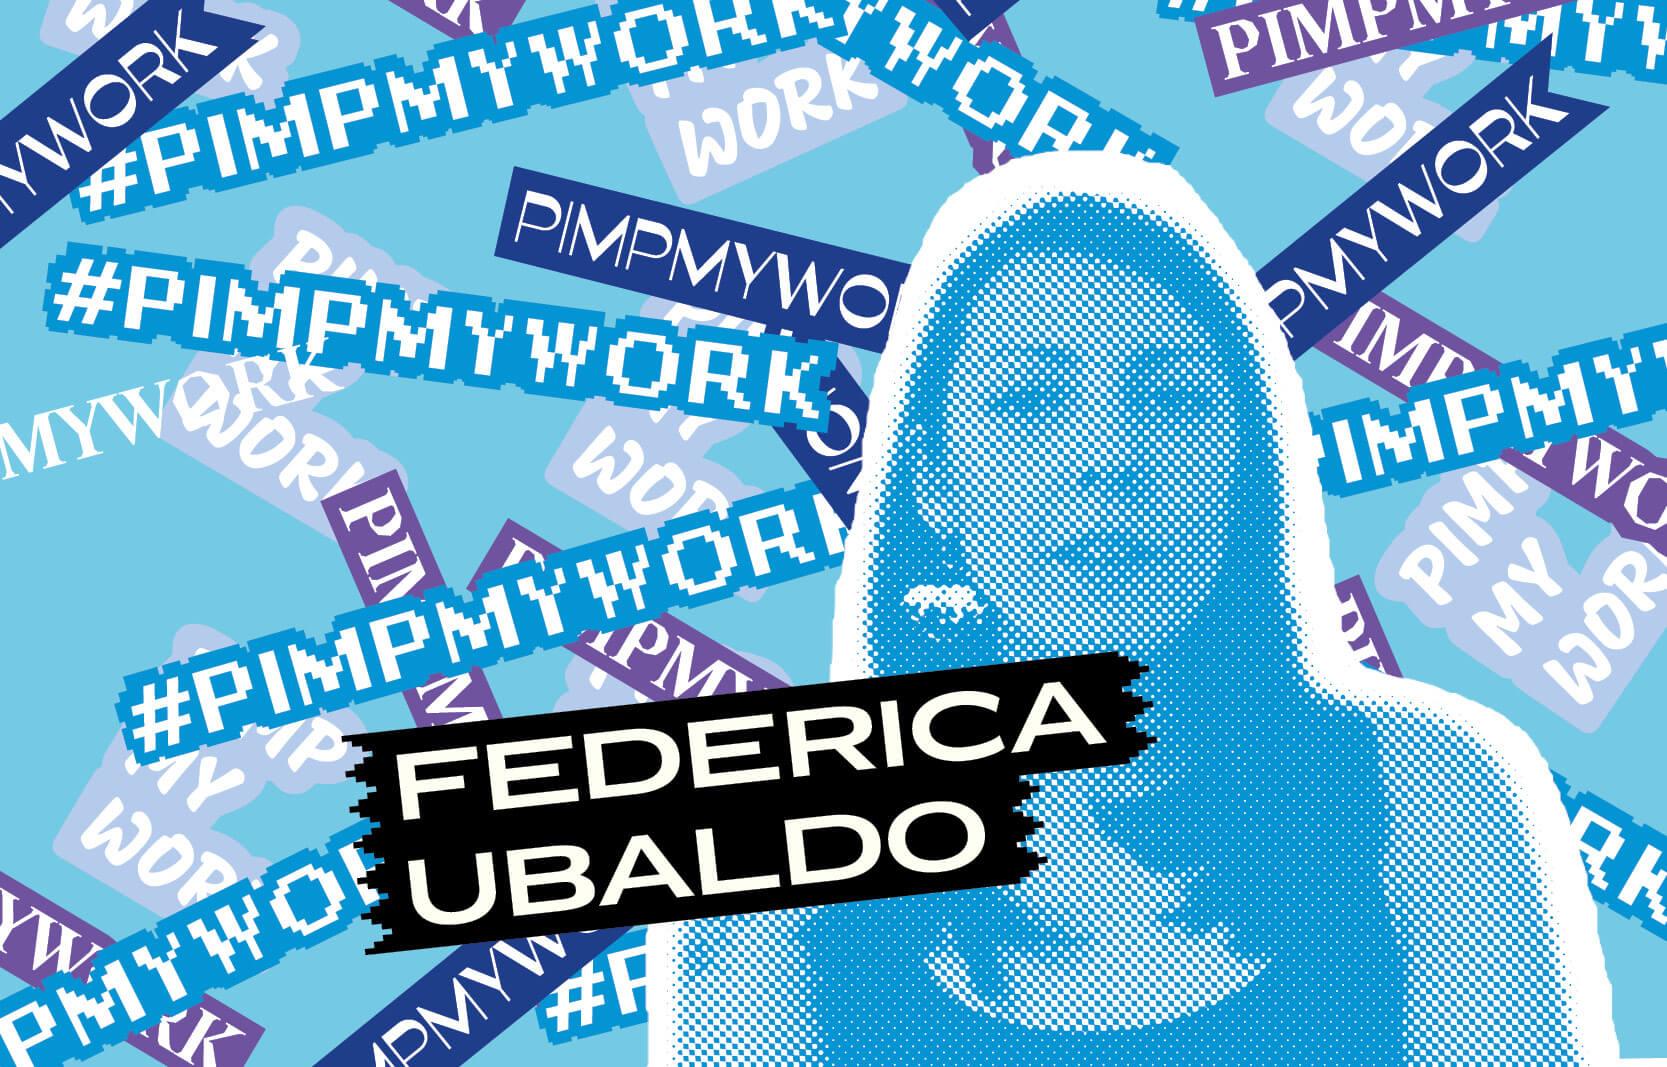 Federica Ubaldo